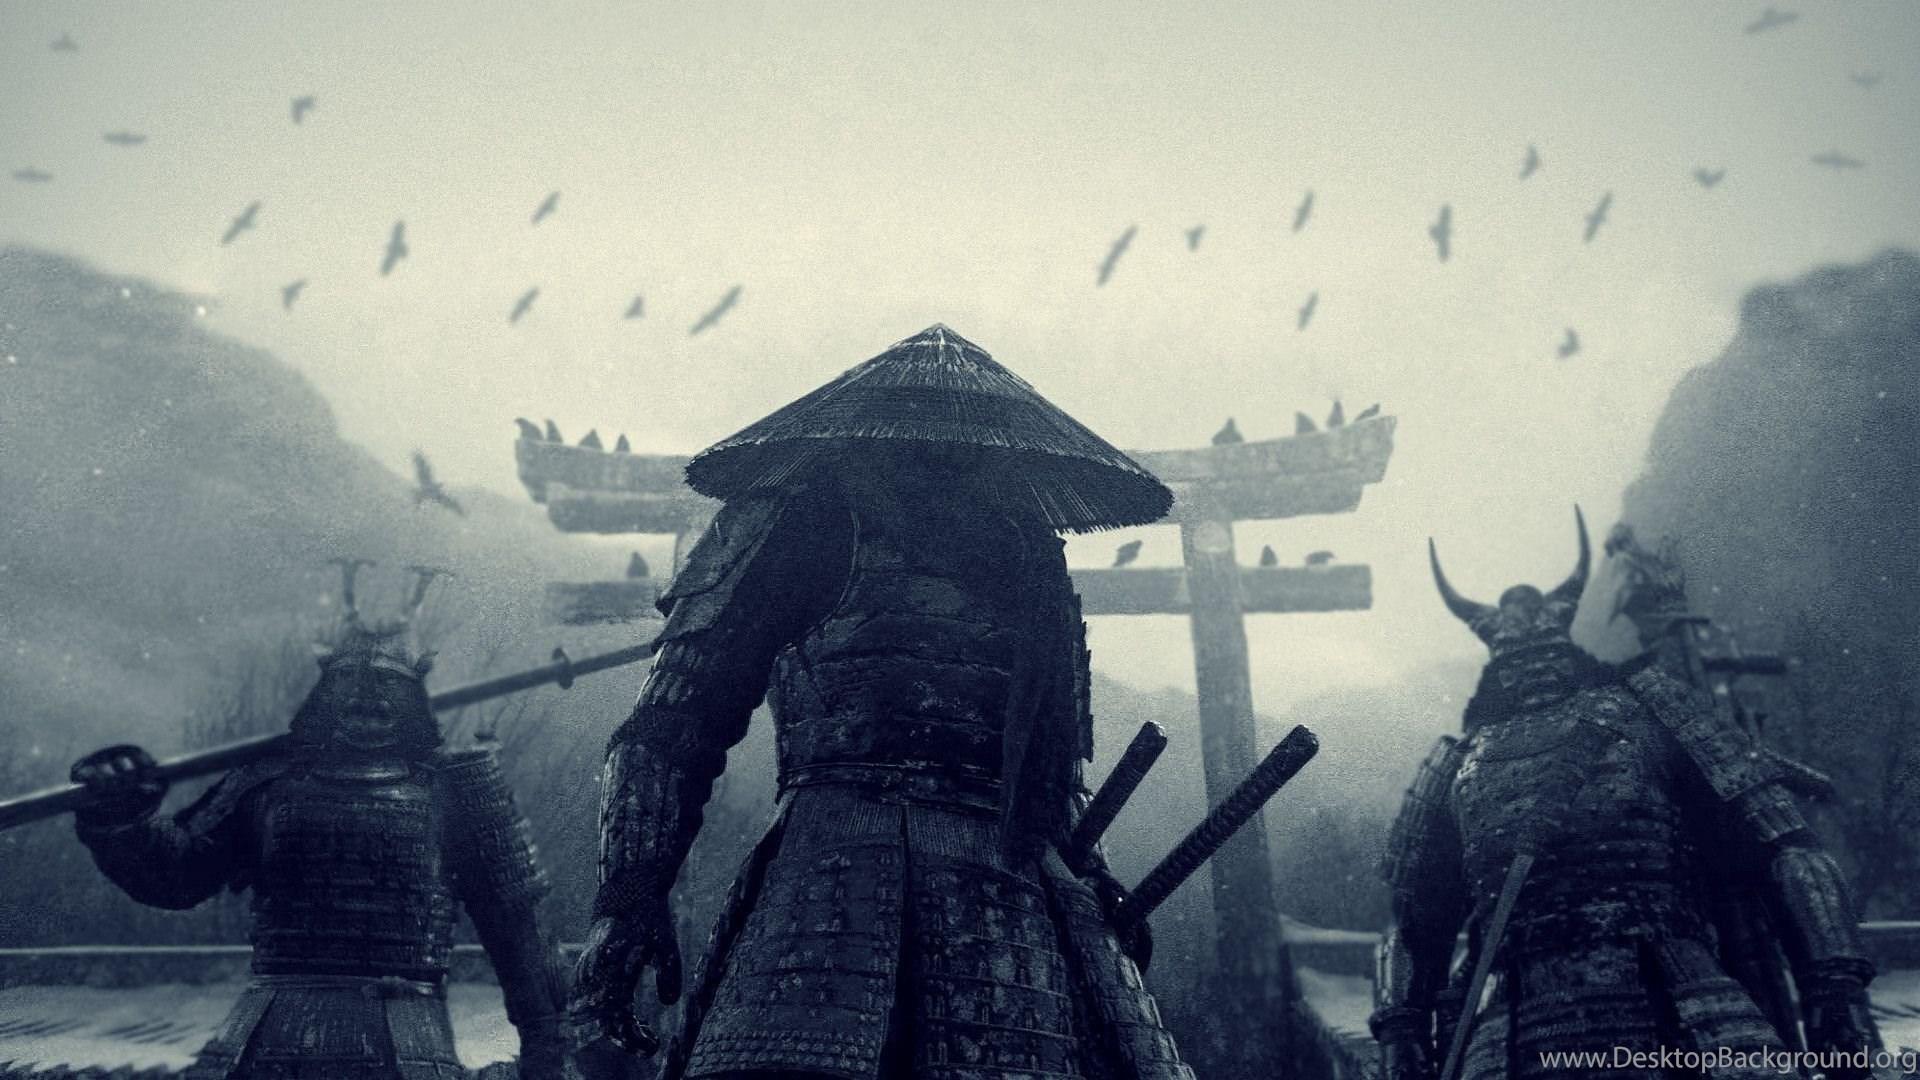 Wallpapers Download 1080x1920 Three Japanese Samurai Hd Desktop Background